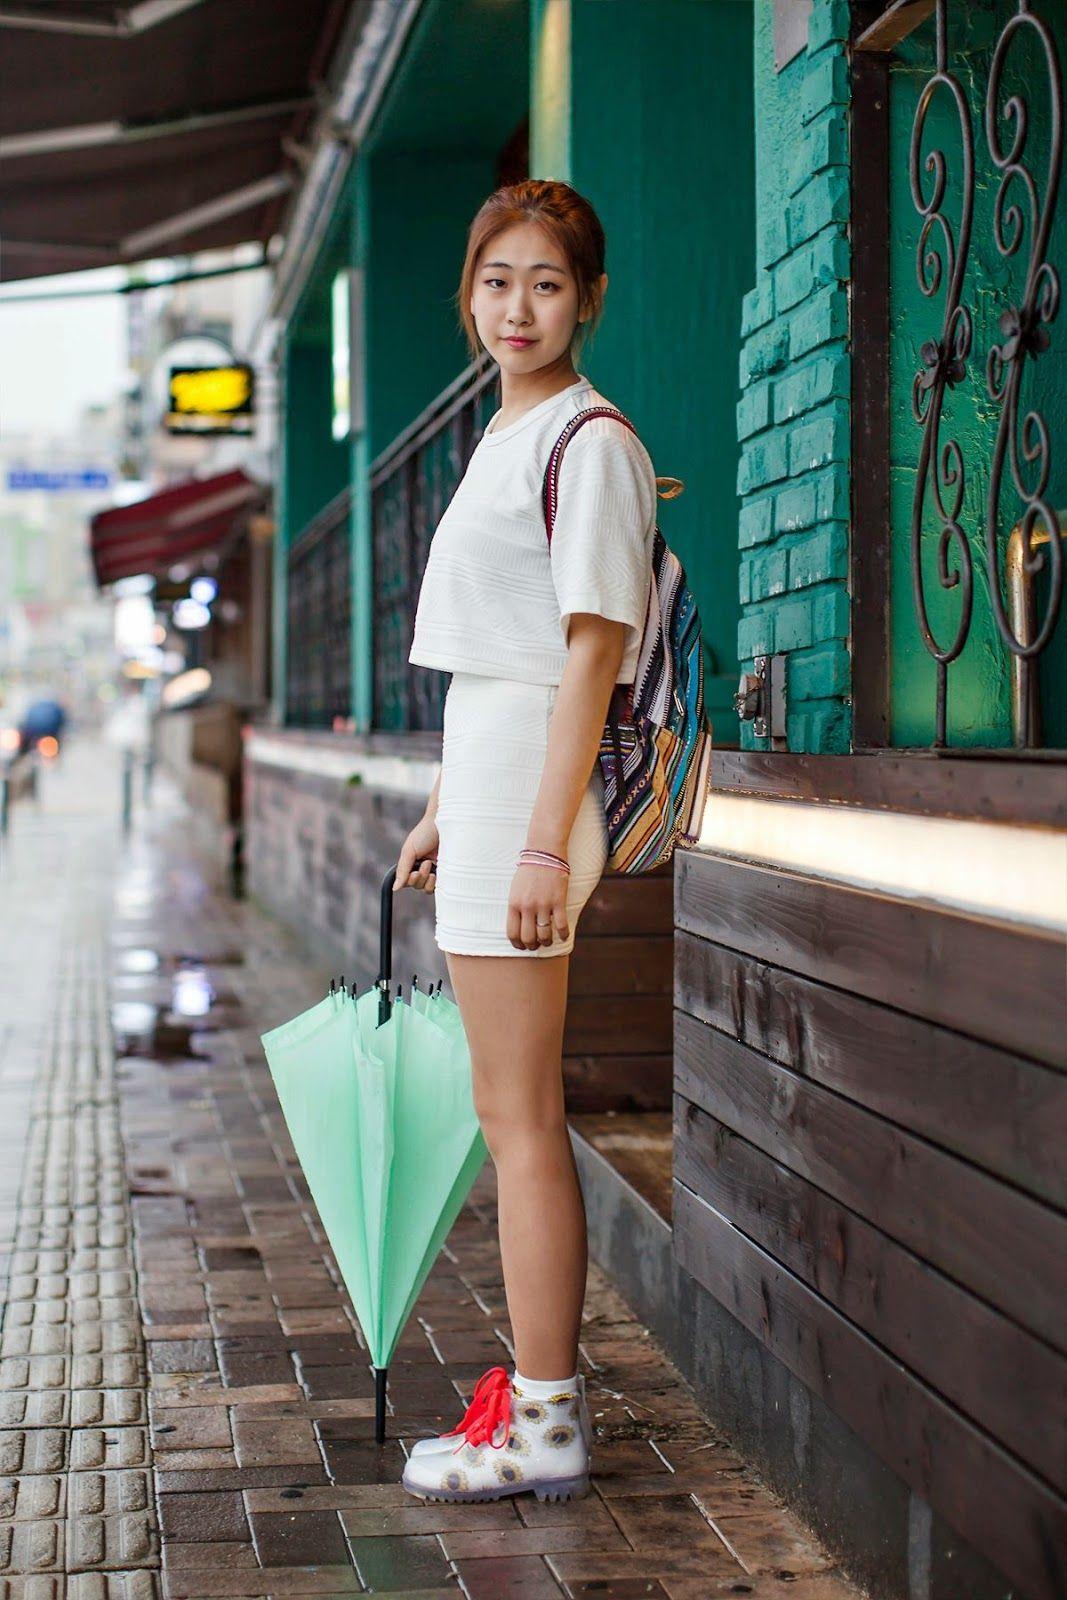 On the street... Seungyeon Woo Busan   echeveau